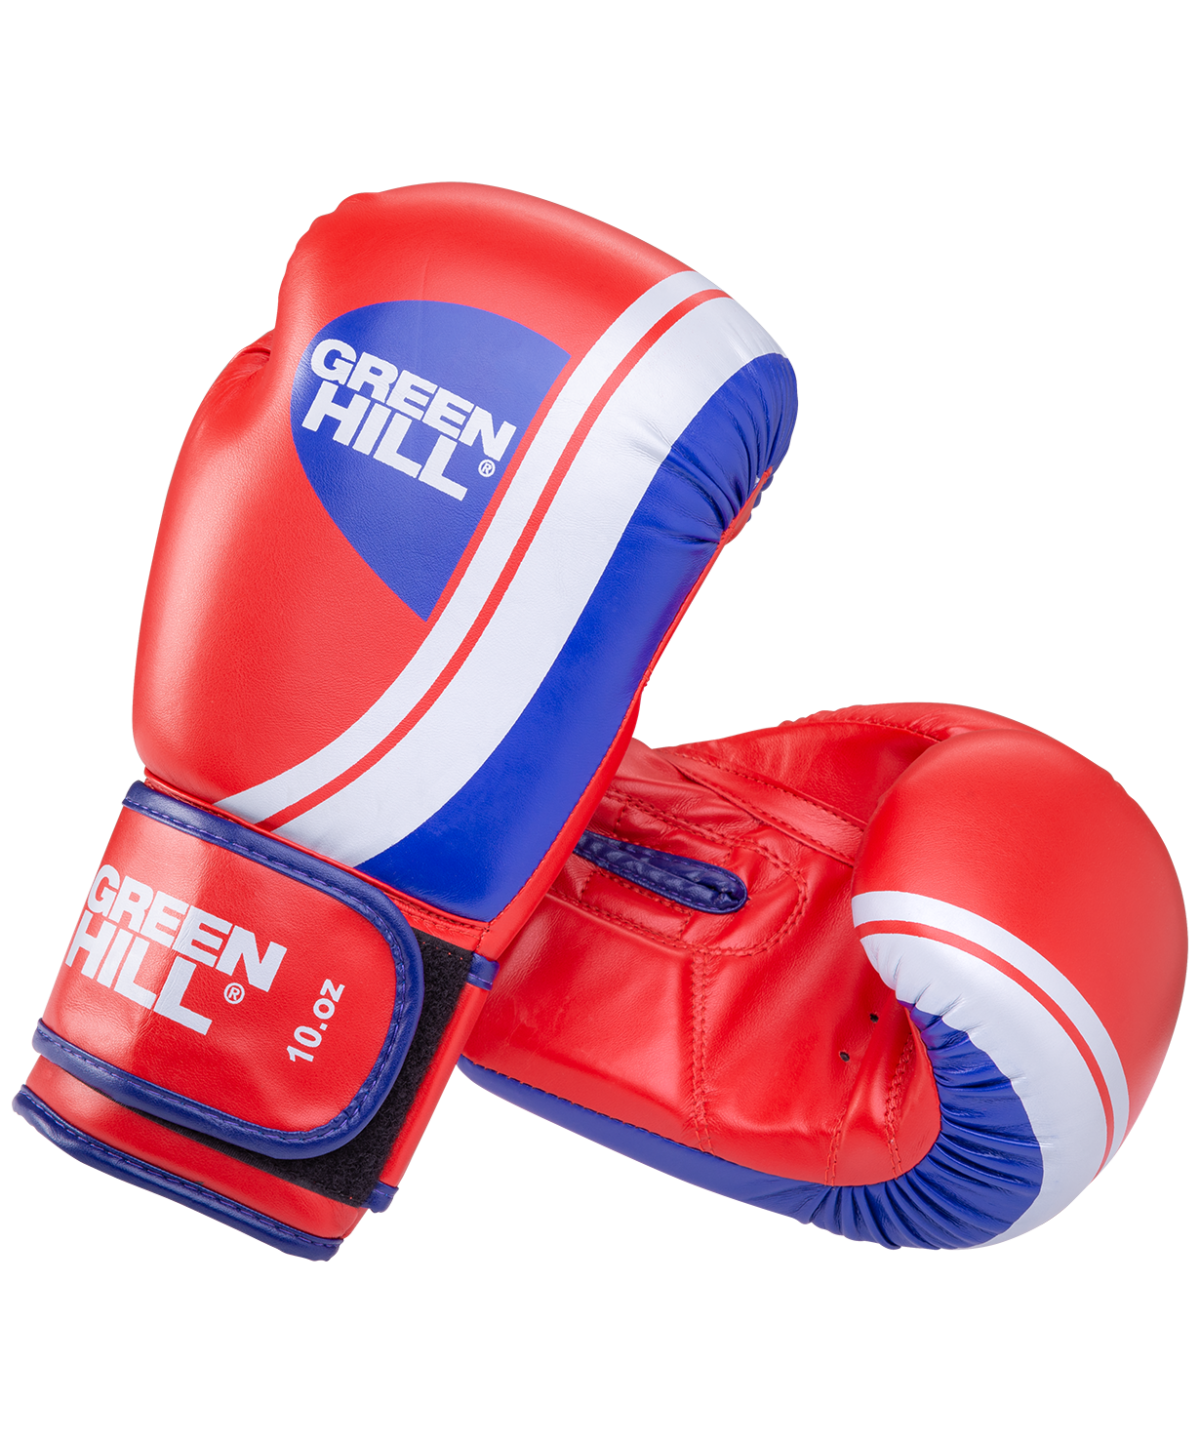 GREEN HILL Перчатки боксерские 10 oz Knockout  BGK-2266: красный - 1